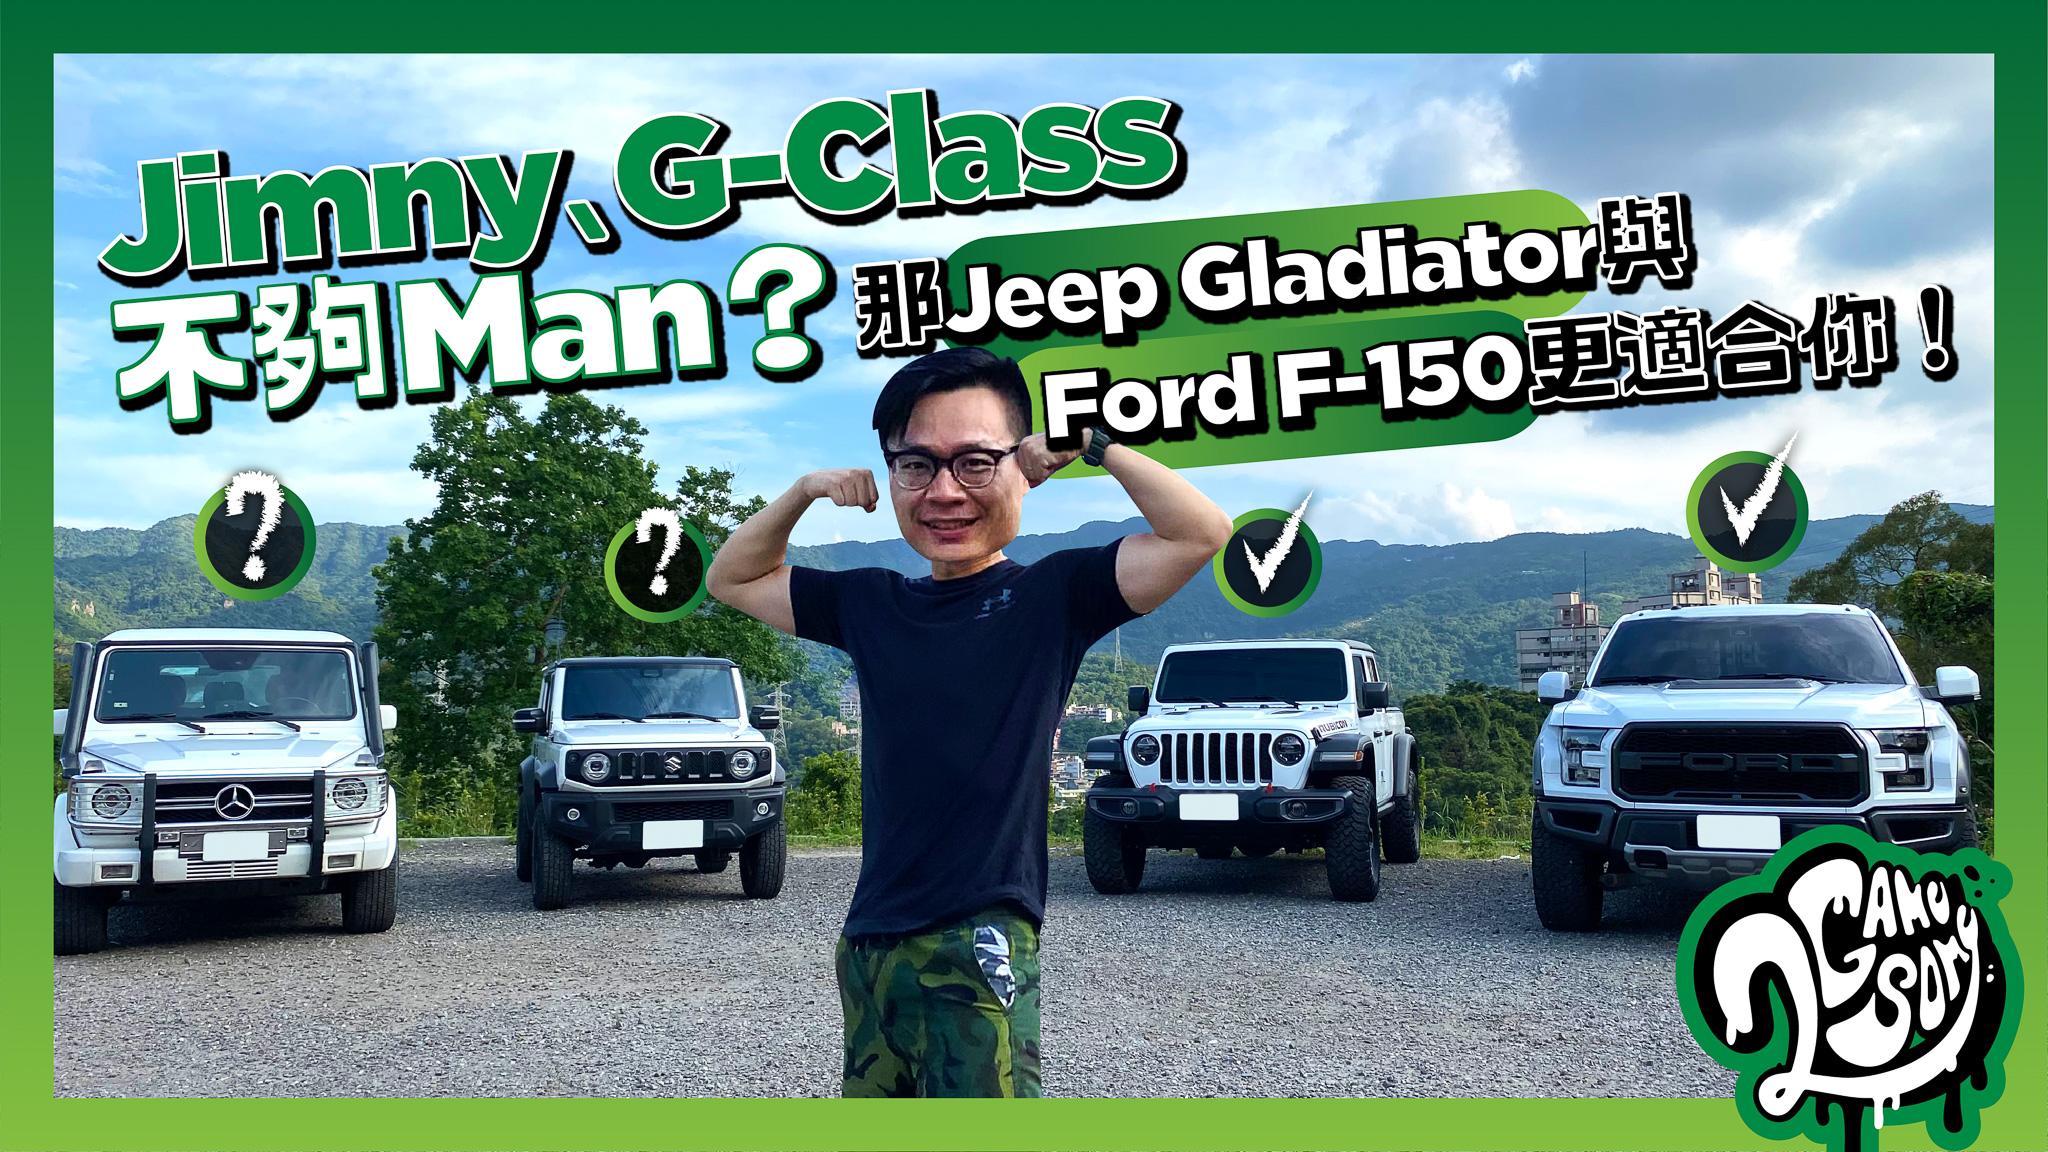 Jimny、G-Class 不夠 Man?那 Jeep Gladiator 與 Ford F-150 更適合你!